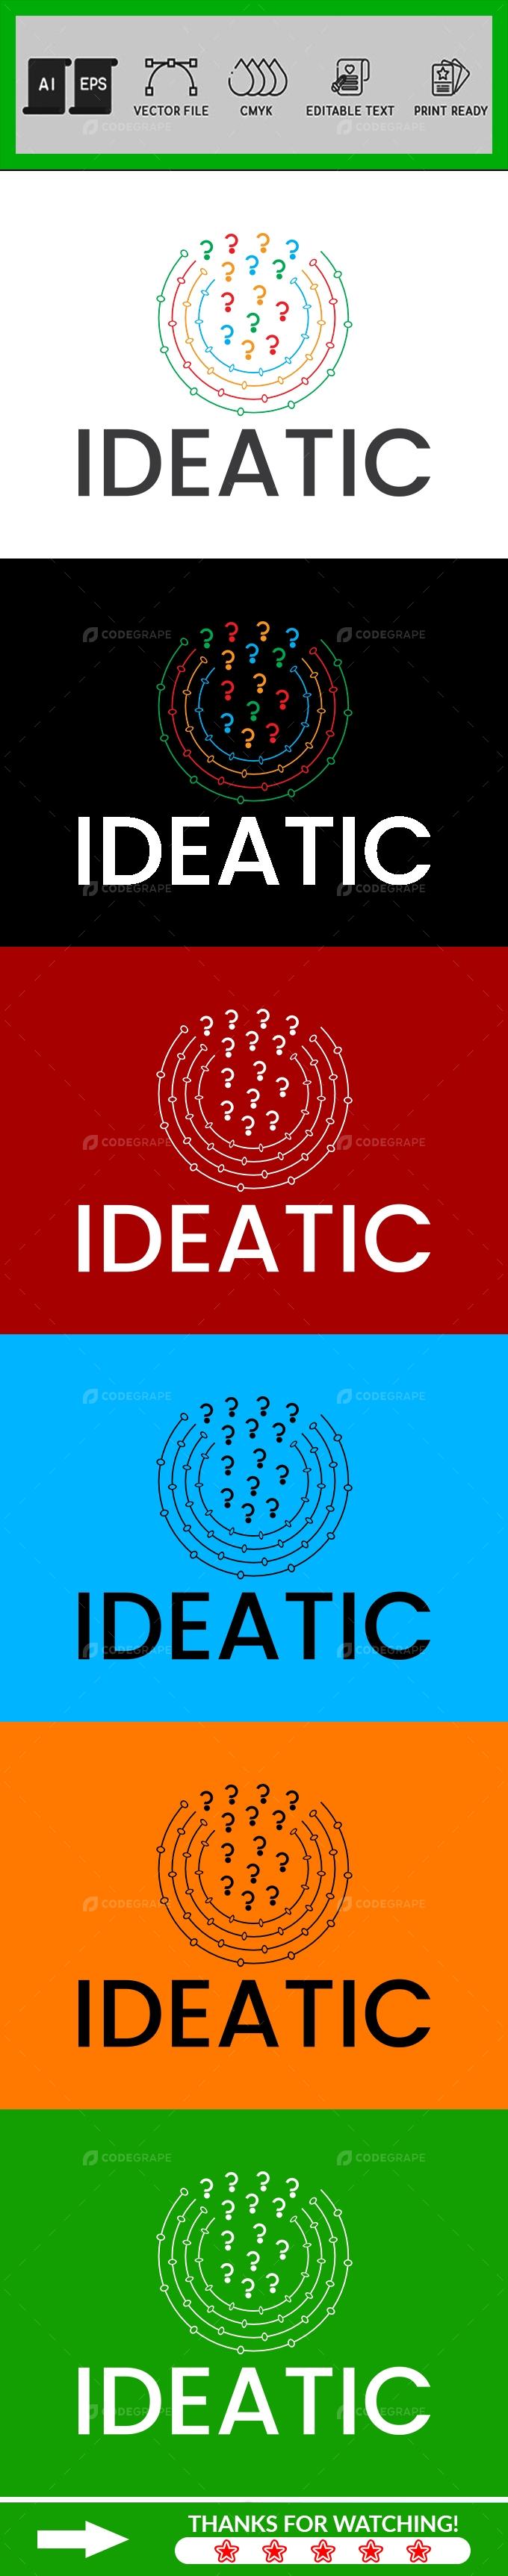 Bright Think Questions Creative Idea Logo Design Template